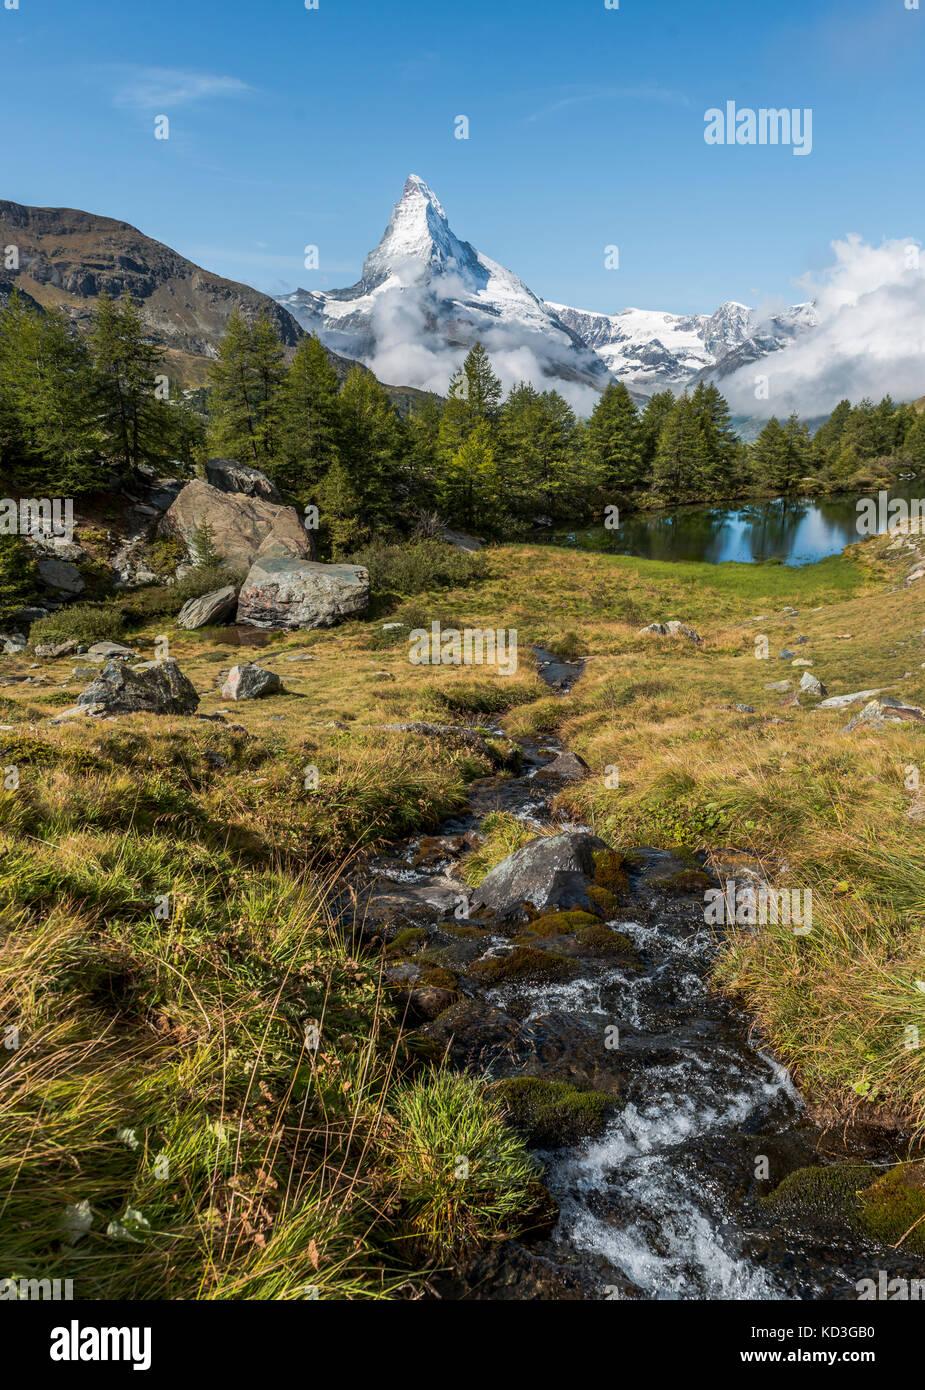 Snow-covered Matterhorn, stream flows into the Grindijsee, Valais, Switzerland - Stock Image